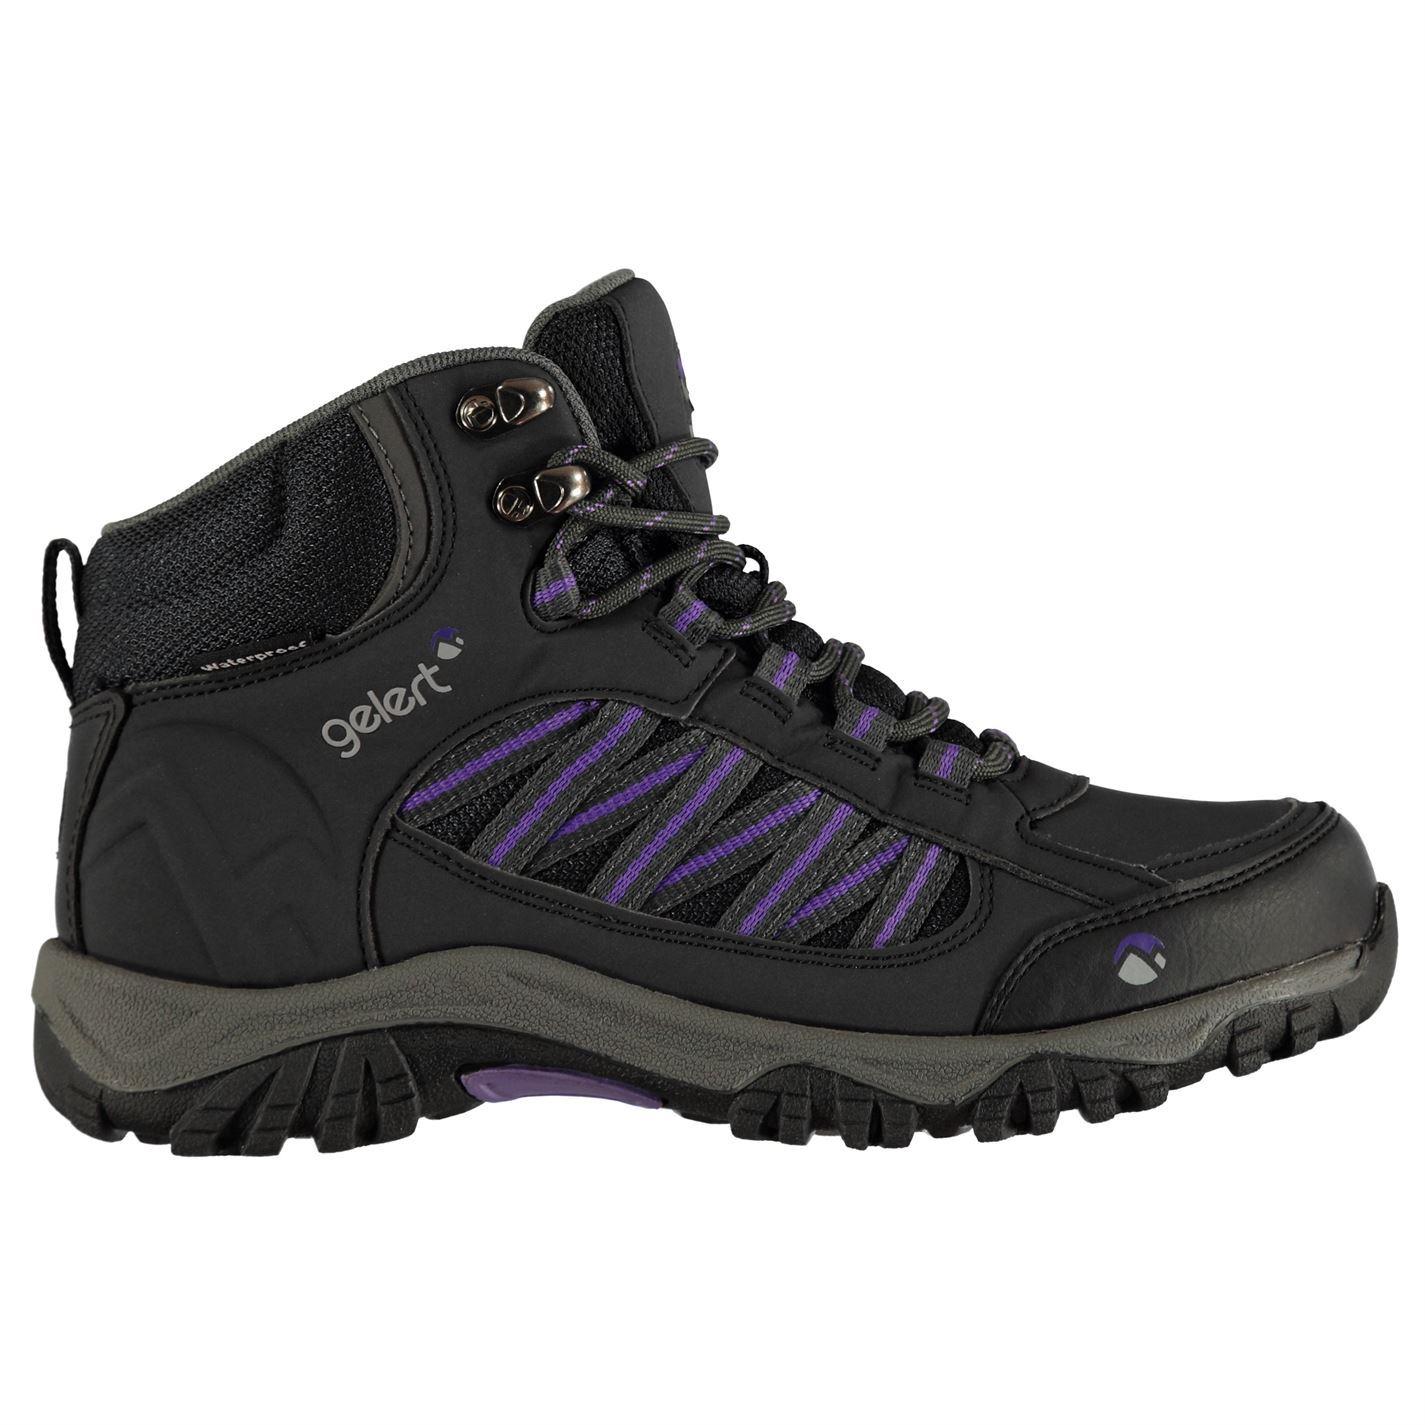 cdff0def047 Details about Gelert Horizon Mid Waterproof Walking Boots Womens Hiking  Trekking Shoes